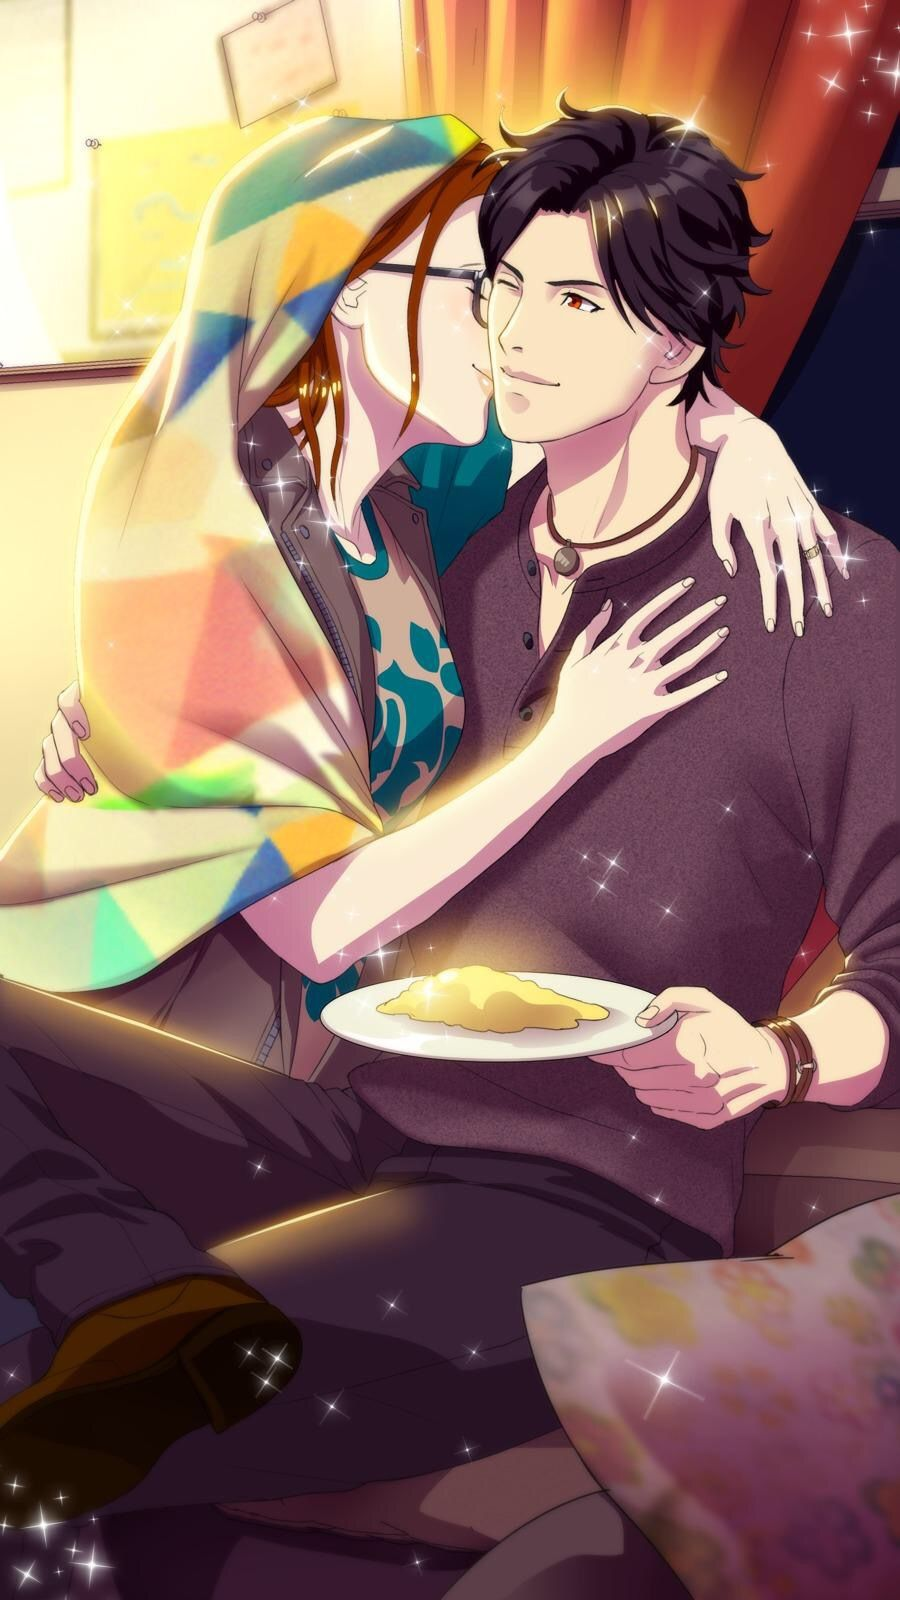 Havenfall is for lovers diego season 8 anime anime love